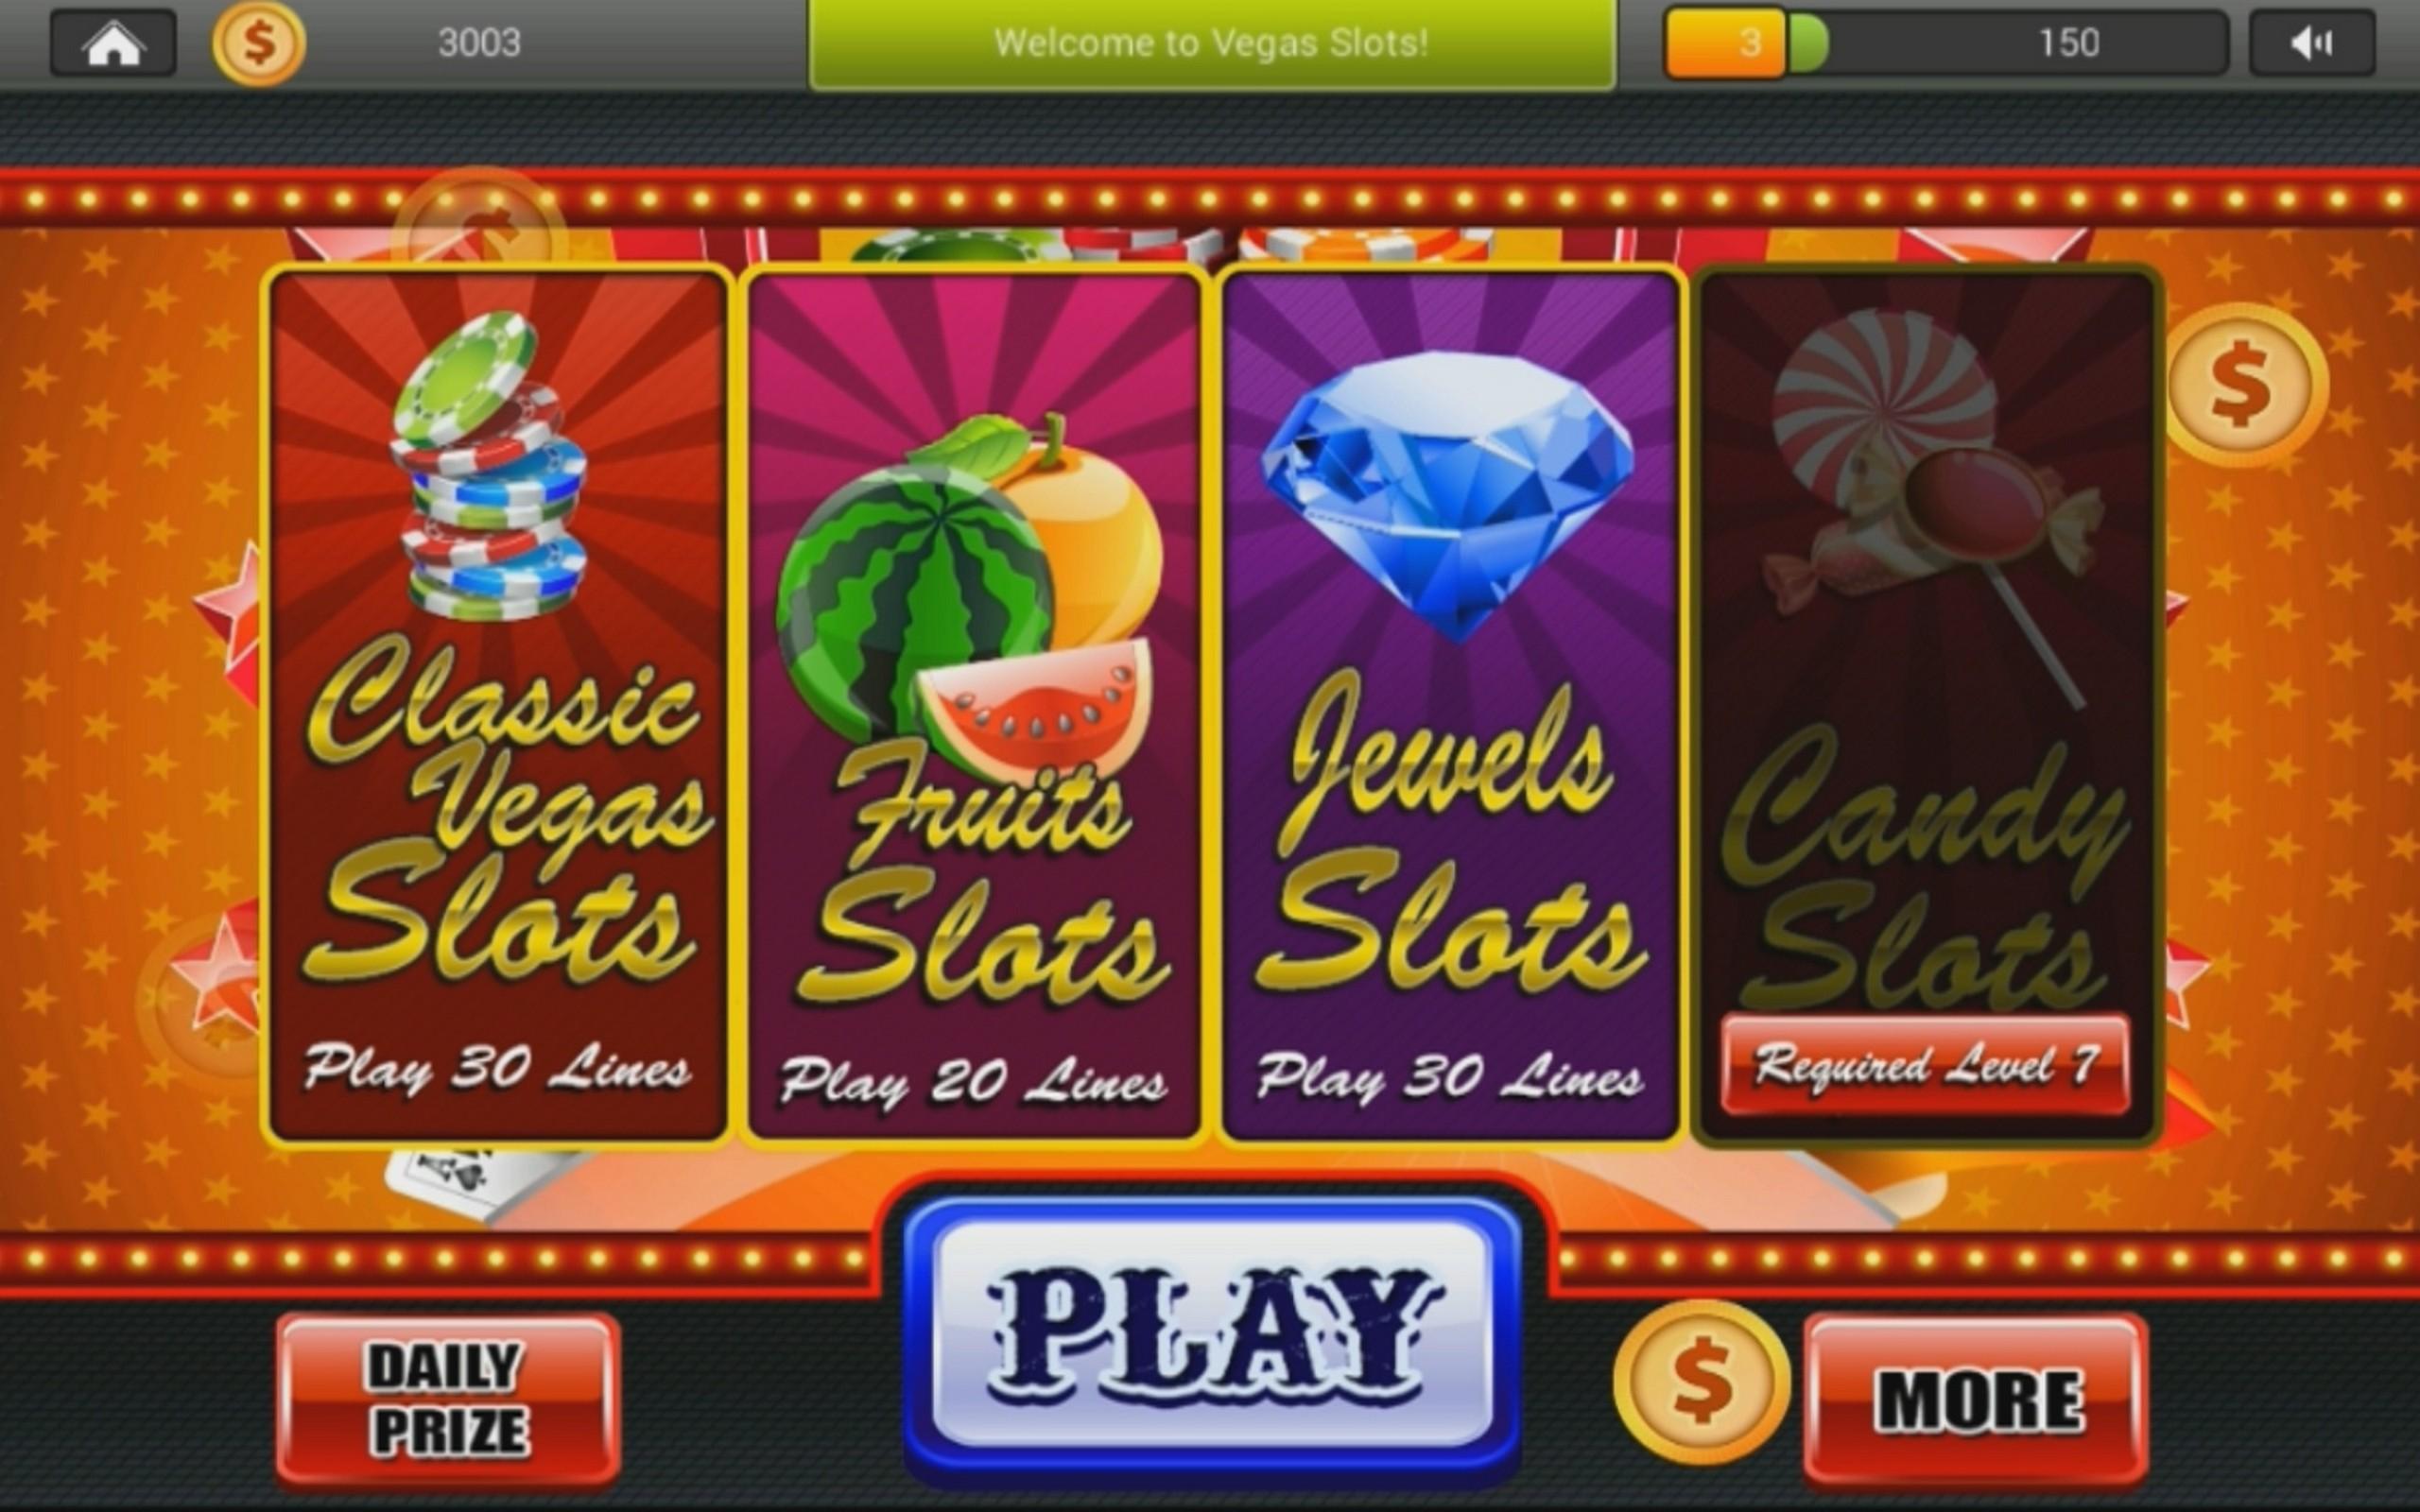 Juegos NightRush com wild vegas casino-370642